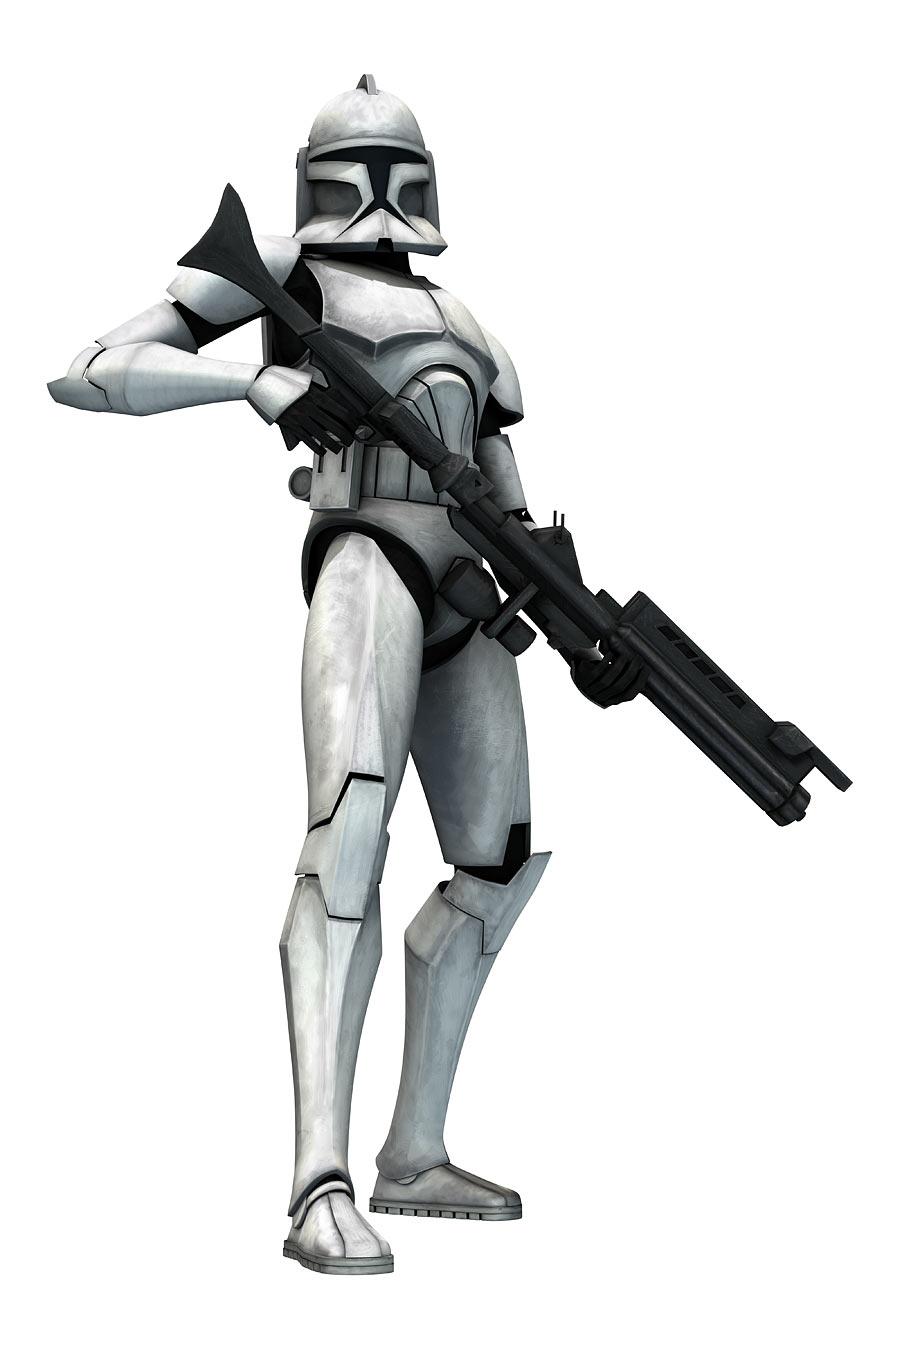 phase 1 armor clone trooper wiki fandom powered by wikia